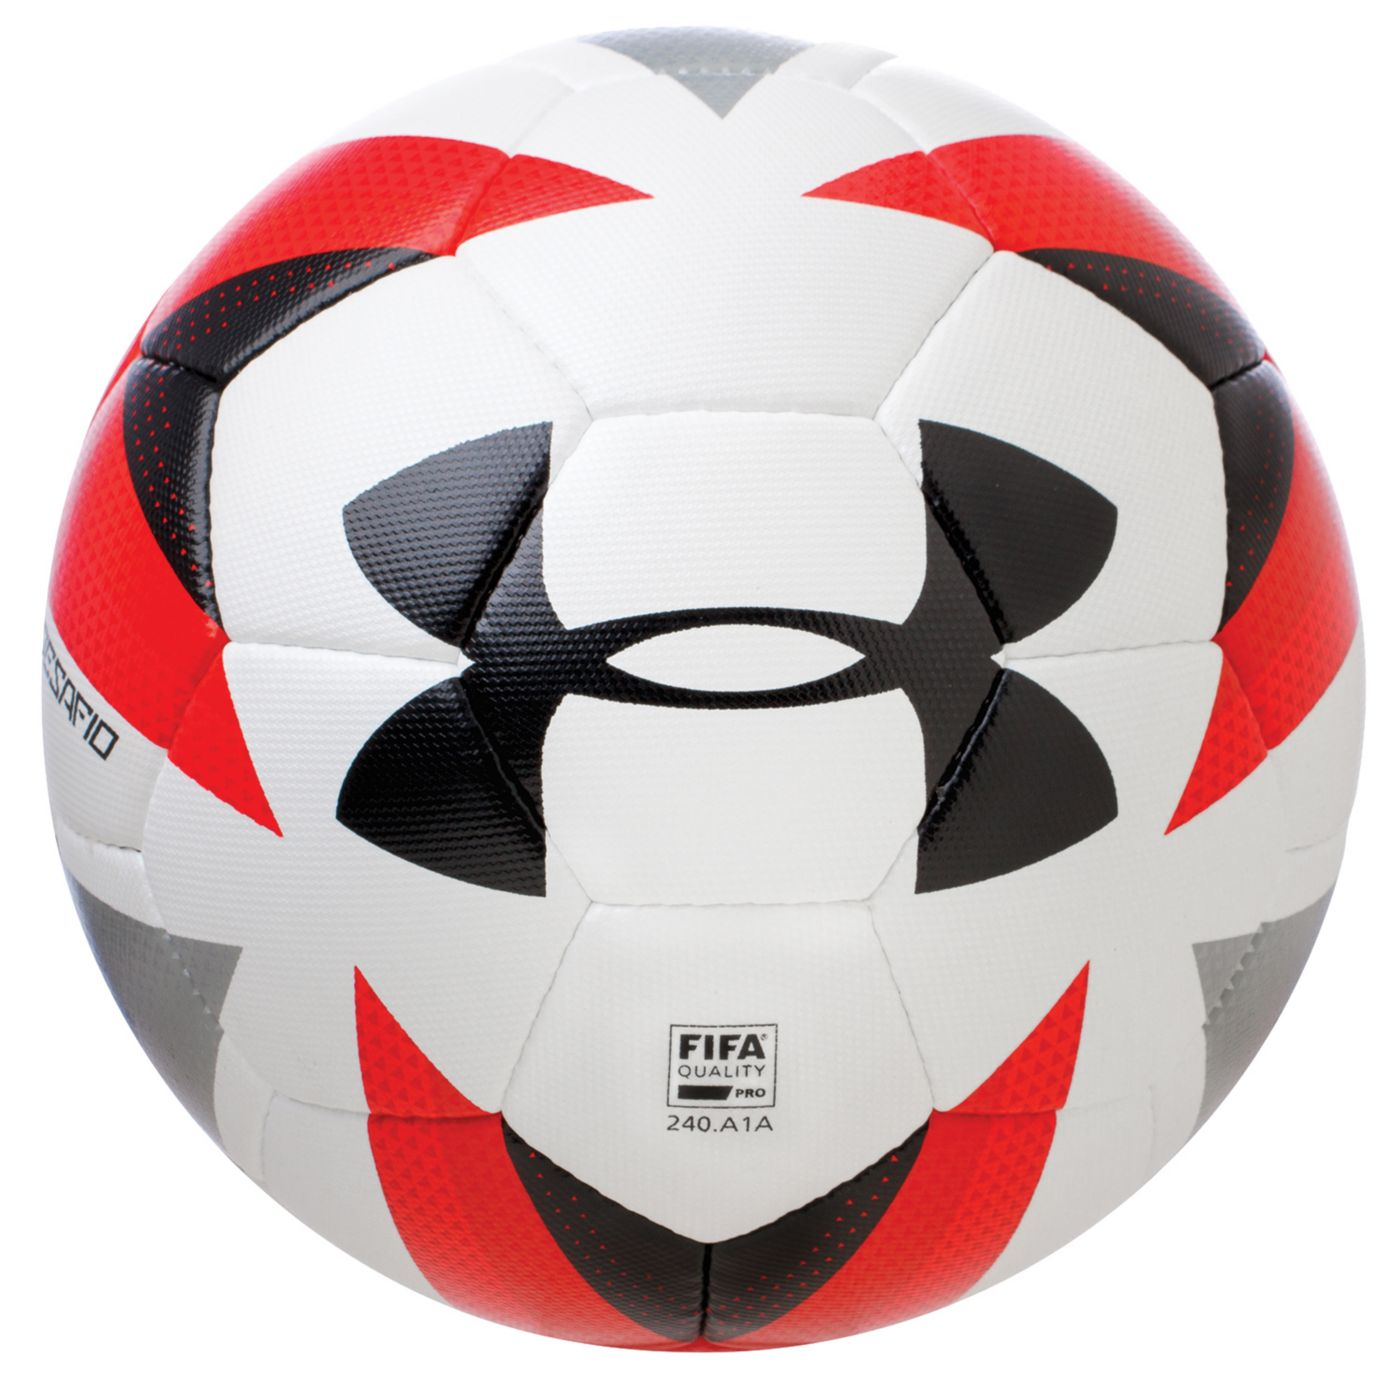 Under Armour Desafio Offical Match Soccer Ball